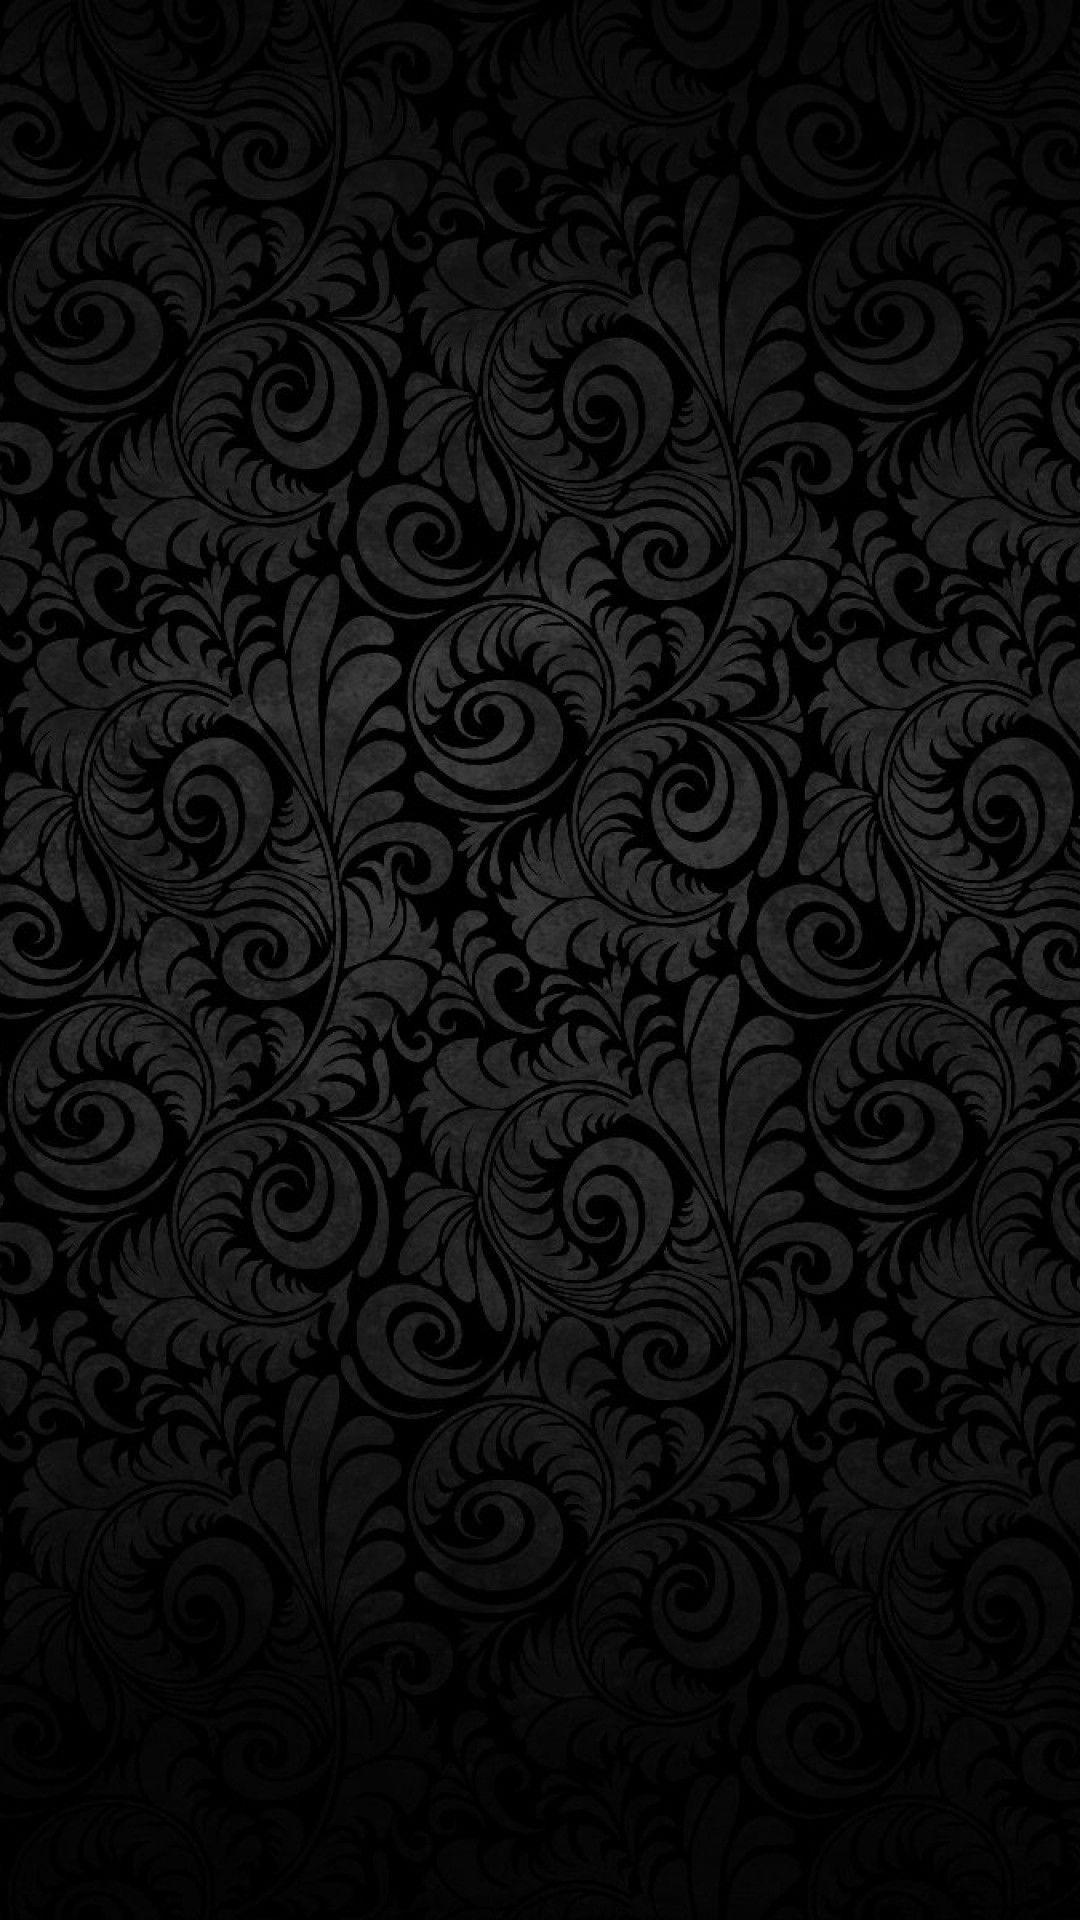 Black Mandala Wallpapers - Top Free Black Mandala ...